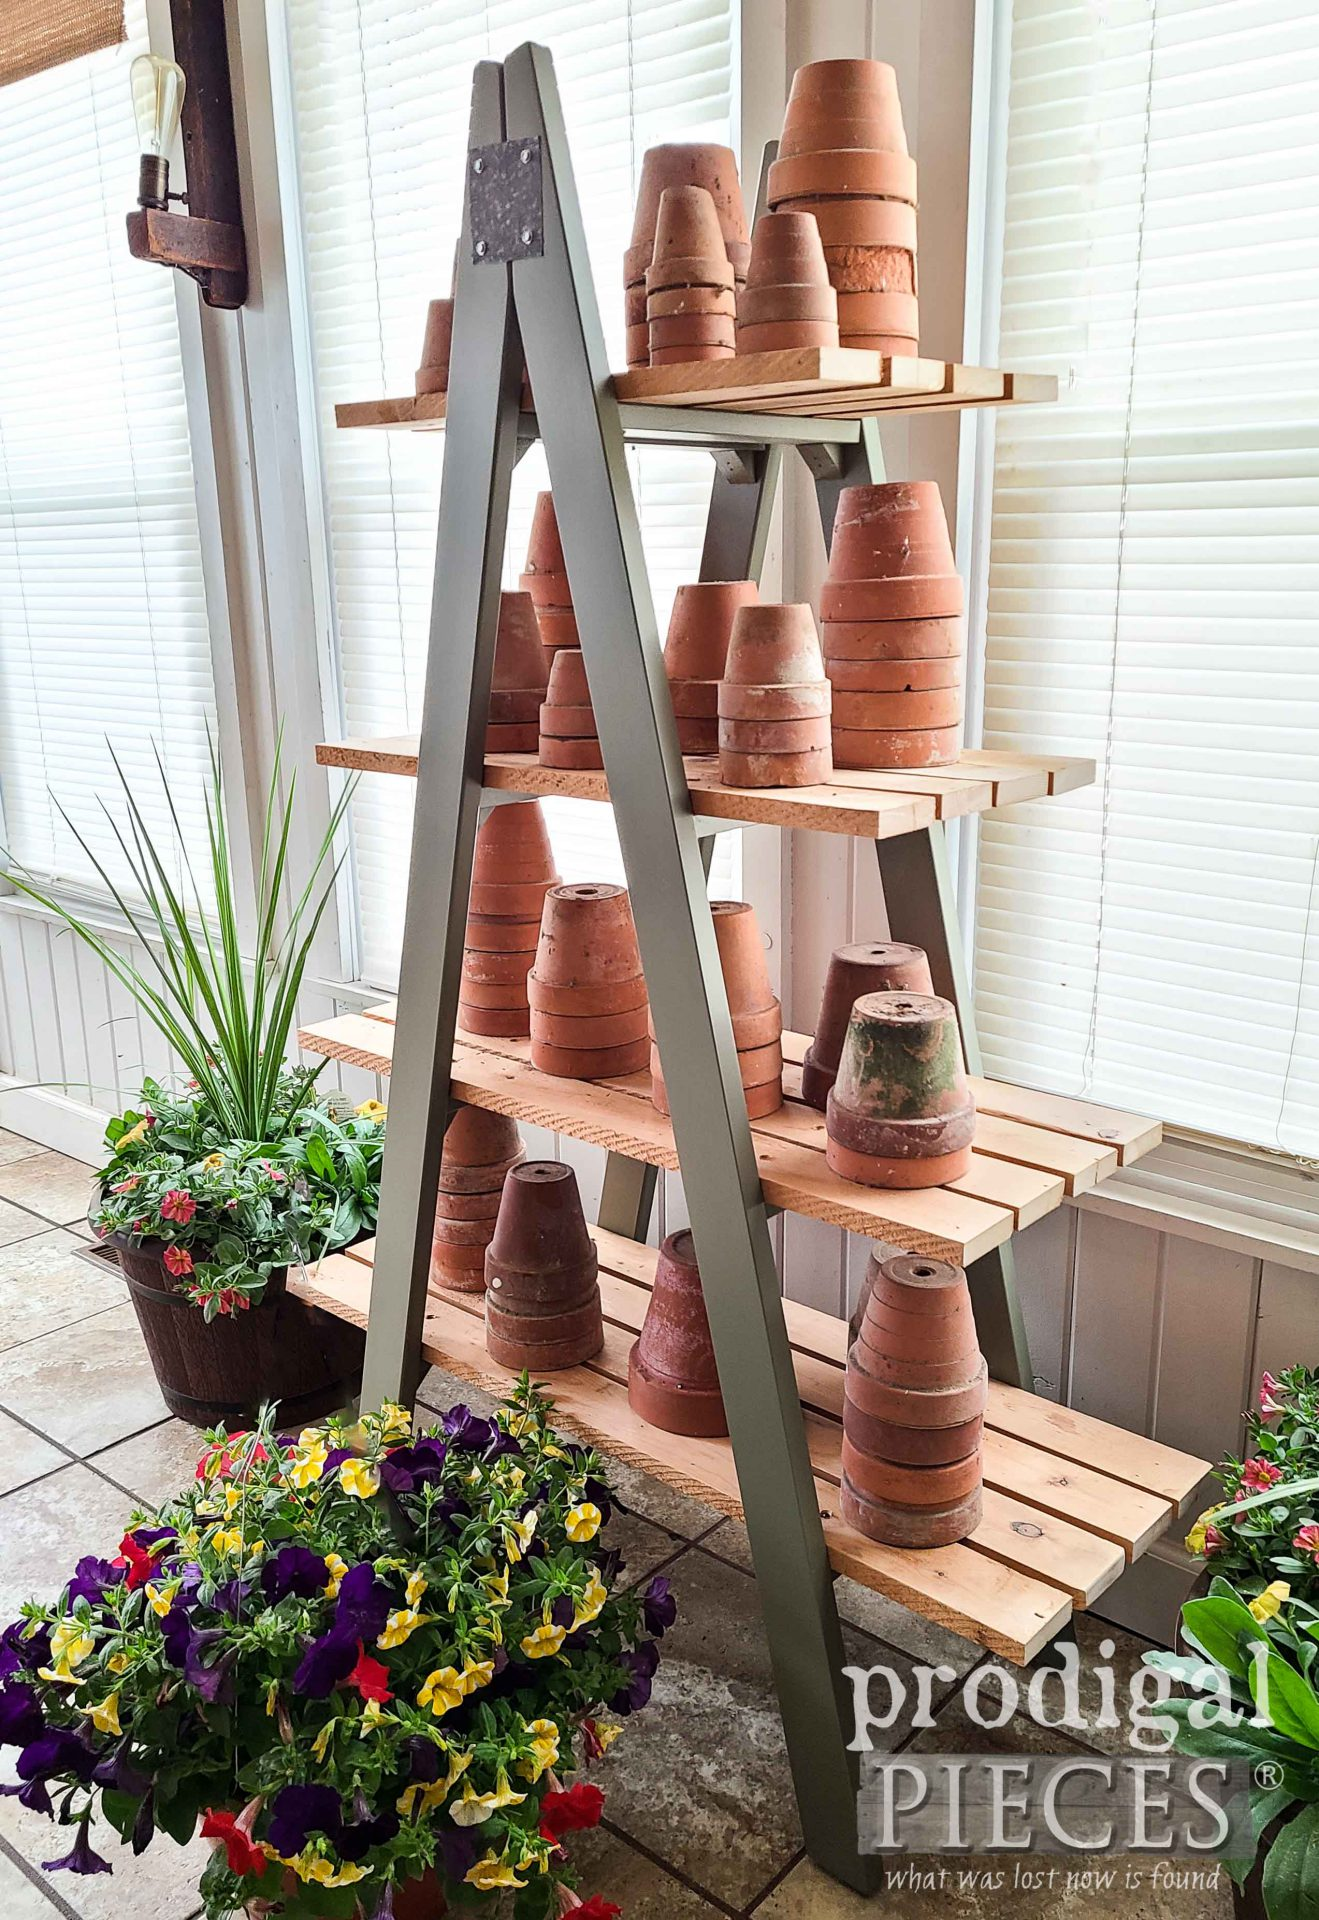 Farmhouse Style Ladder Shelf by Larissa of Prodigal Pieces | prodigalpieces.com #prodigalpieces #diy #home #homedecor #farmhouse #garden